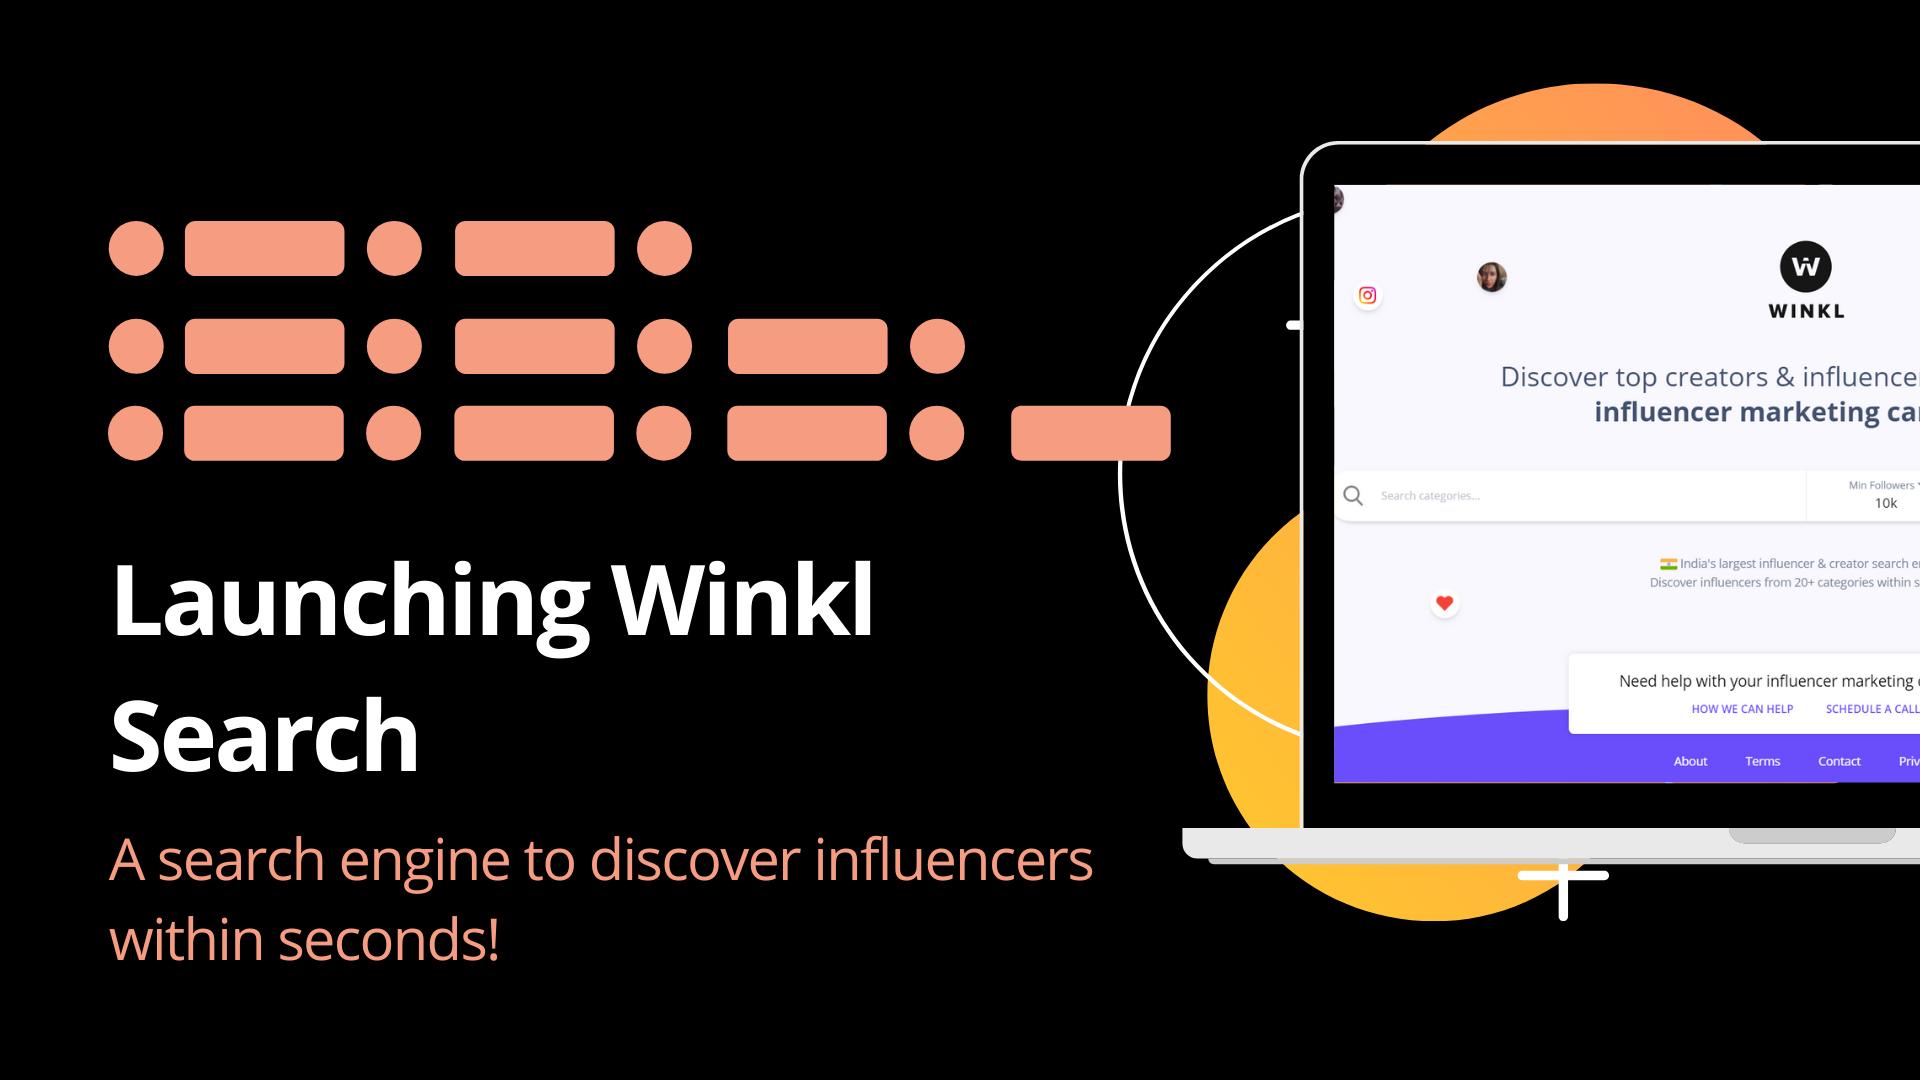 Democratizing Influencer Marketing : Winkl Search image